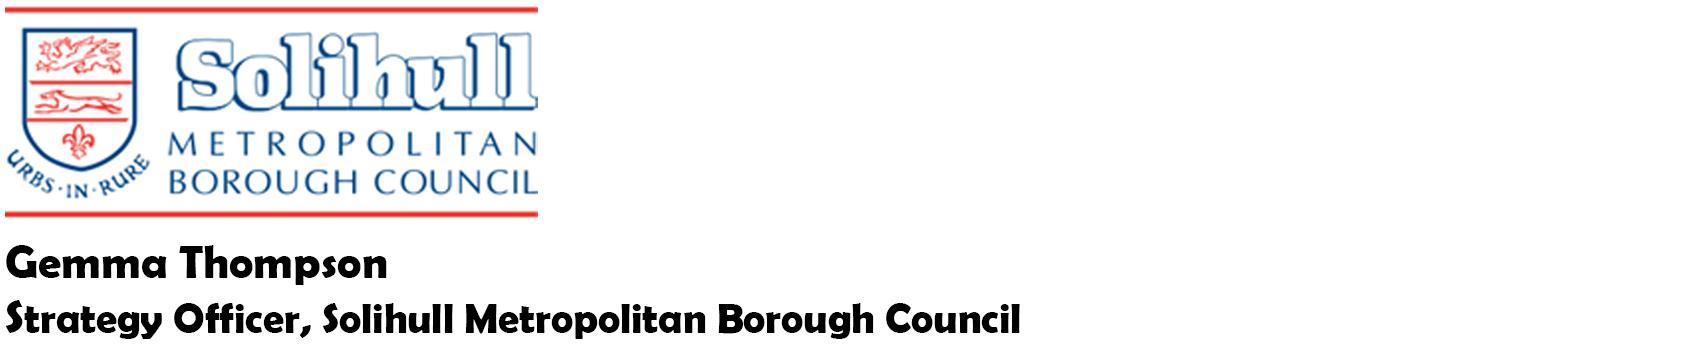 Gemma Thompson - Strategy Officer, Solihull Metropolitan Borough Council